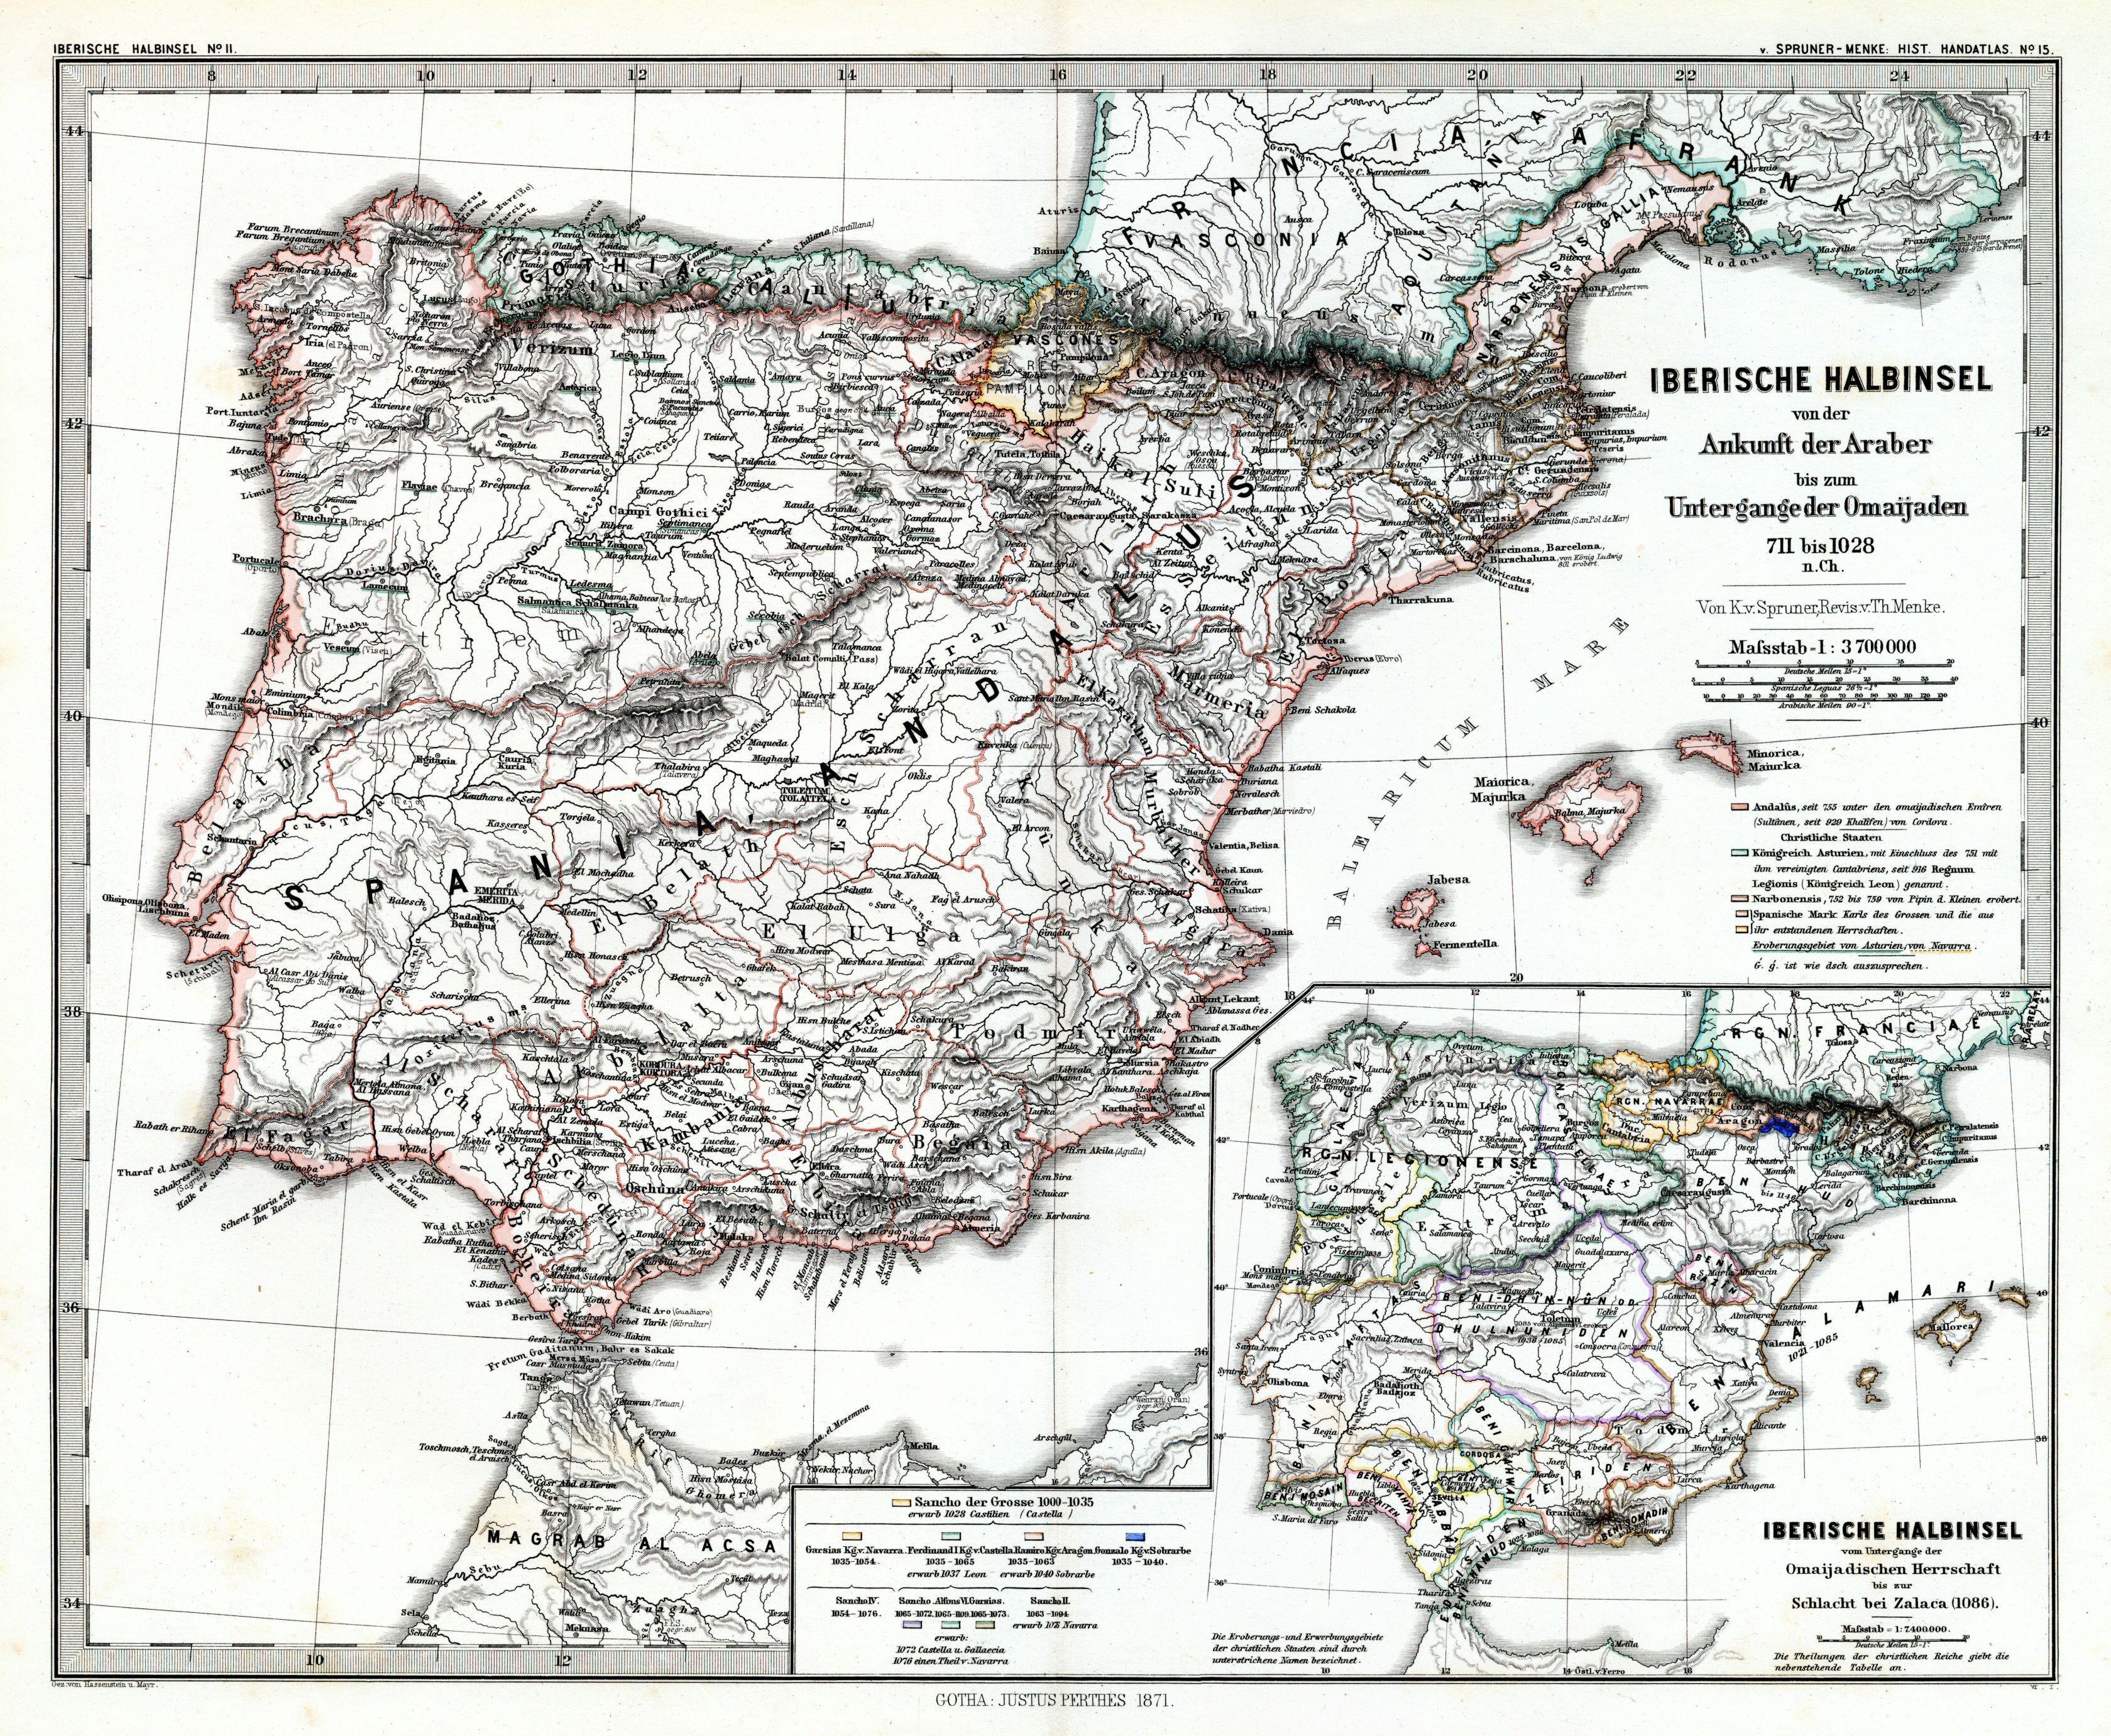 File:(Spruner-Menke, map 15) The Iberian peninsula 711-1028 ...